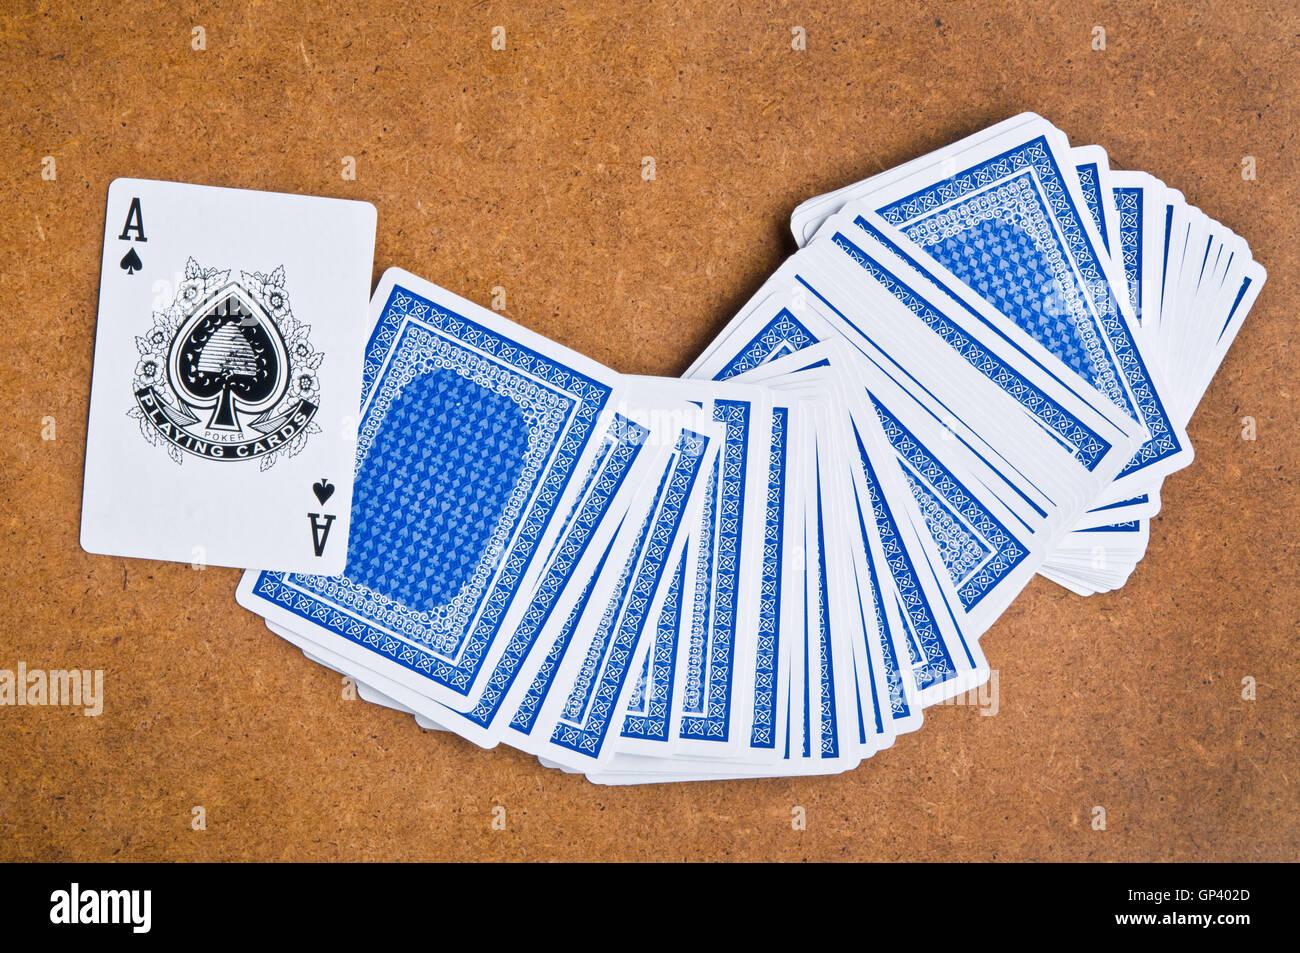 Spielkarte Pik-Ass Stockfoto